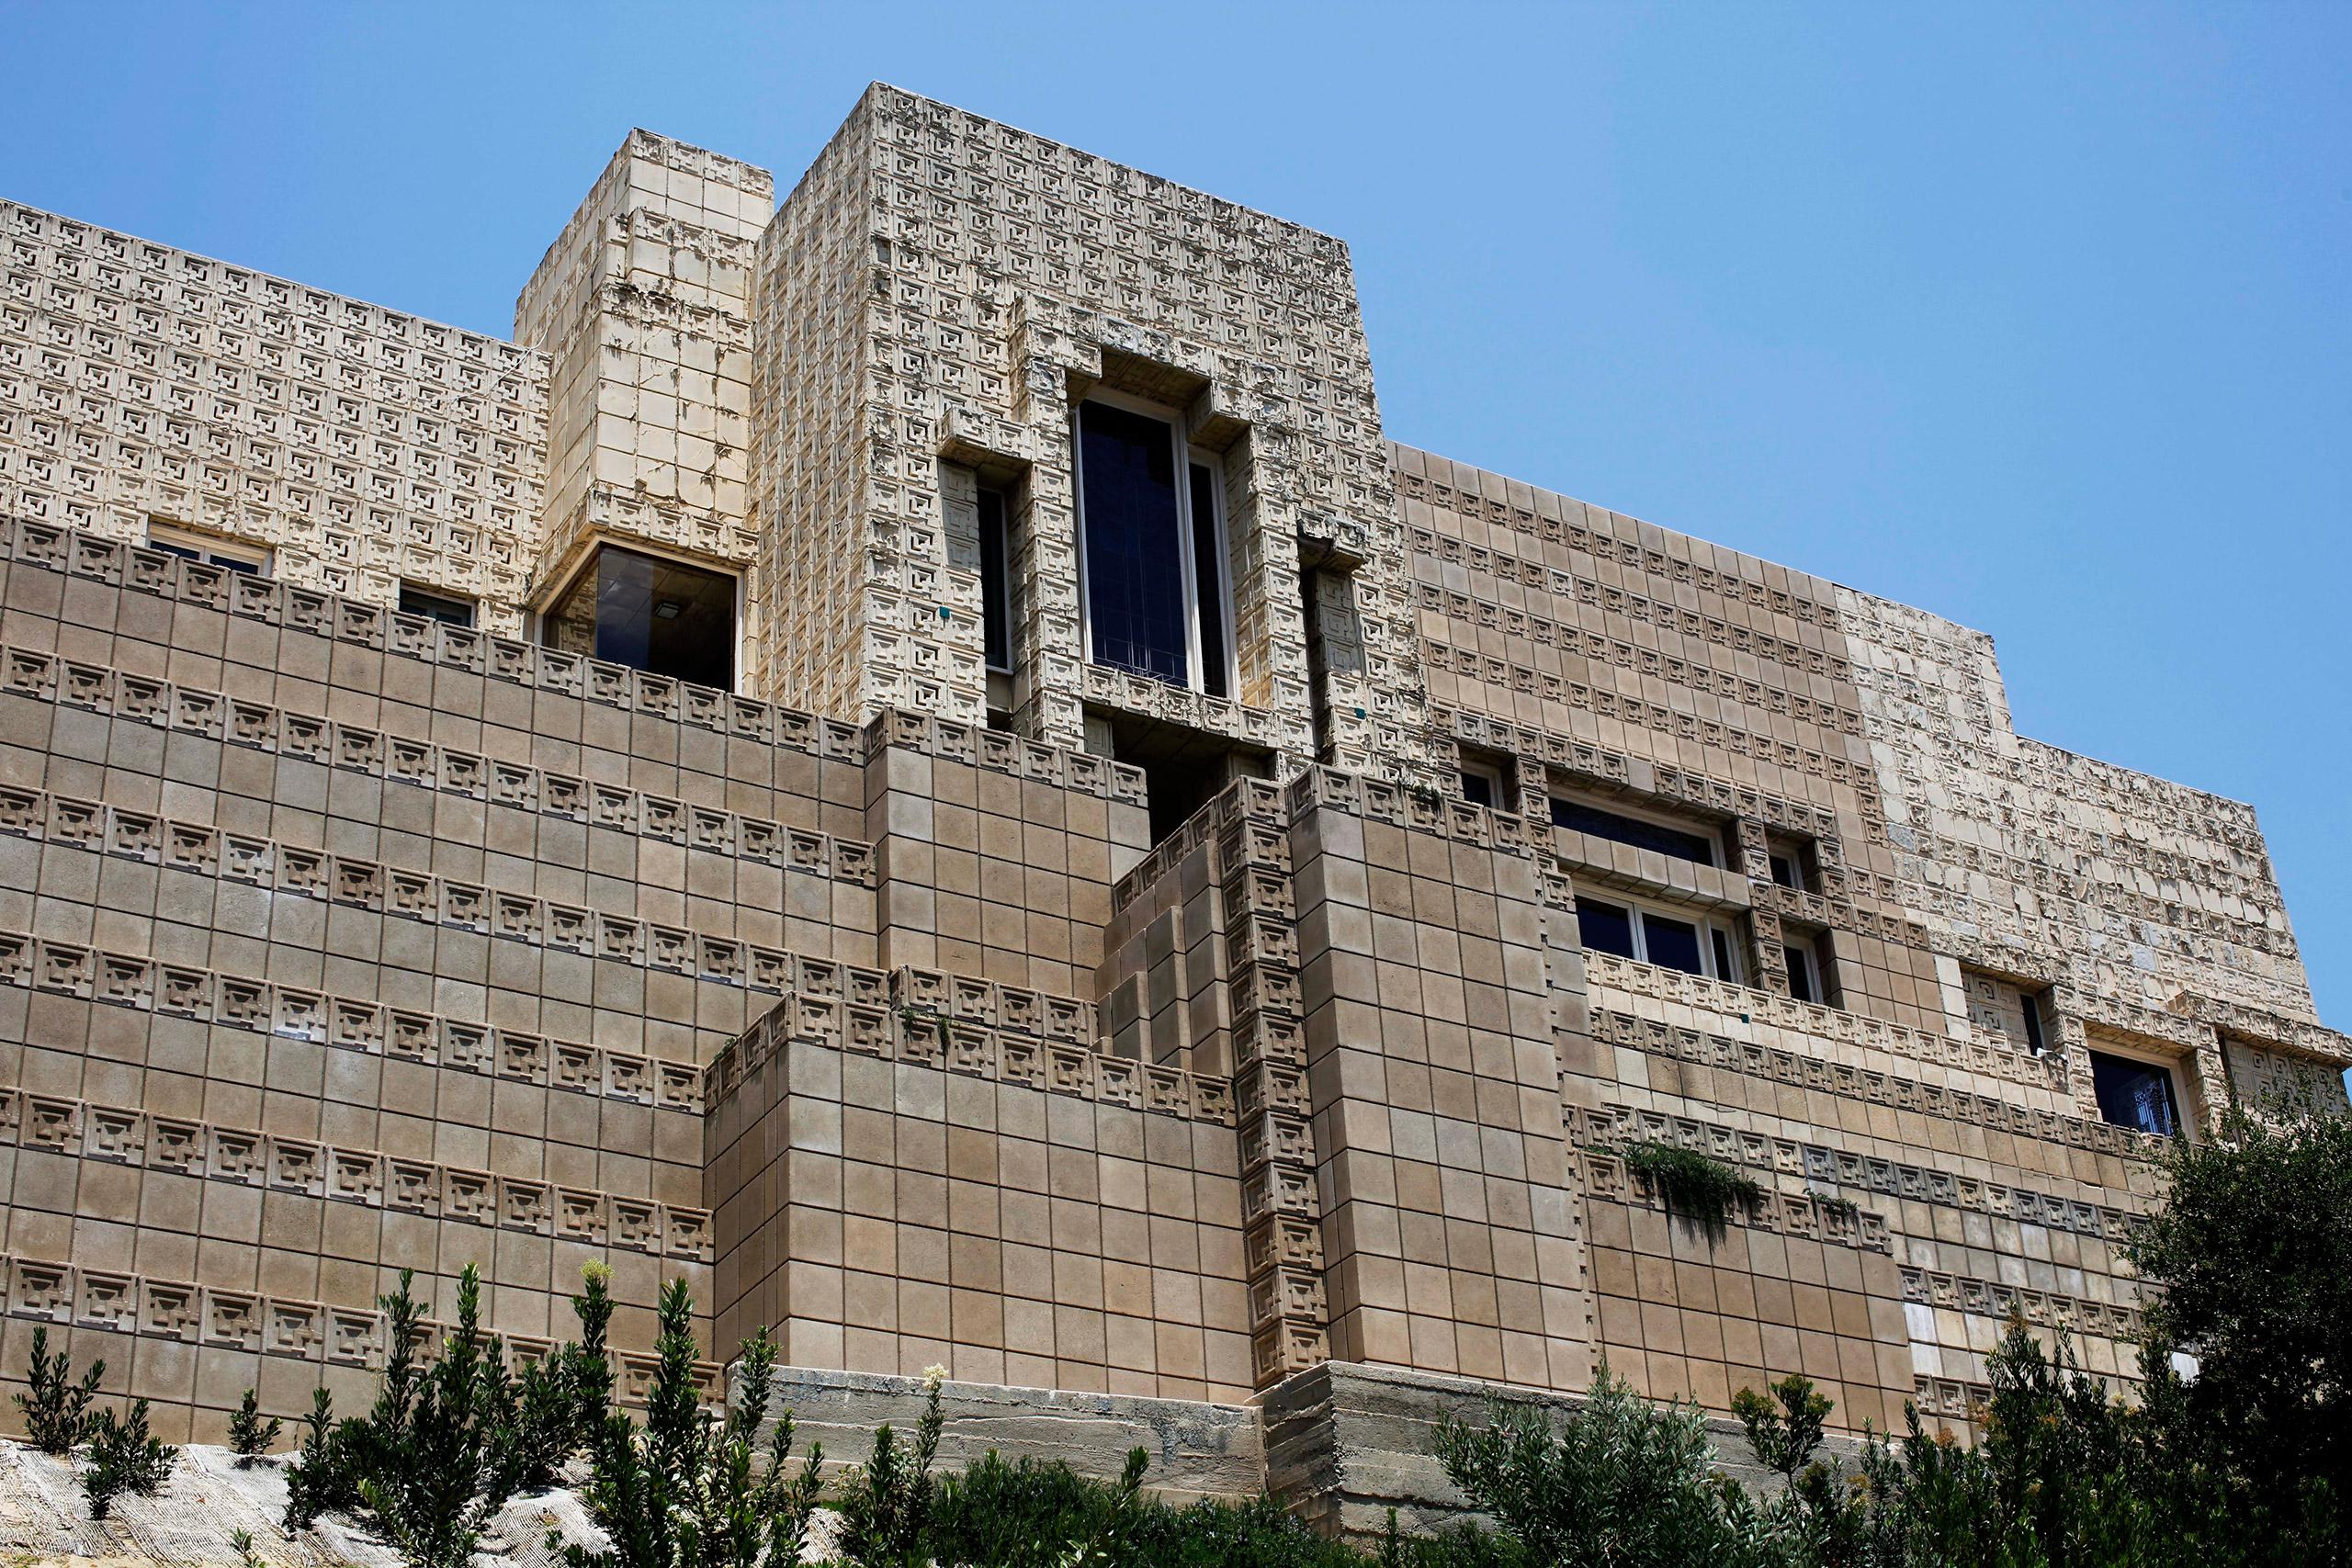 Frank Lloyd Wright's Ennis House in Los Angeles. Built circa 1924.